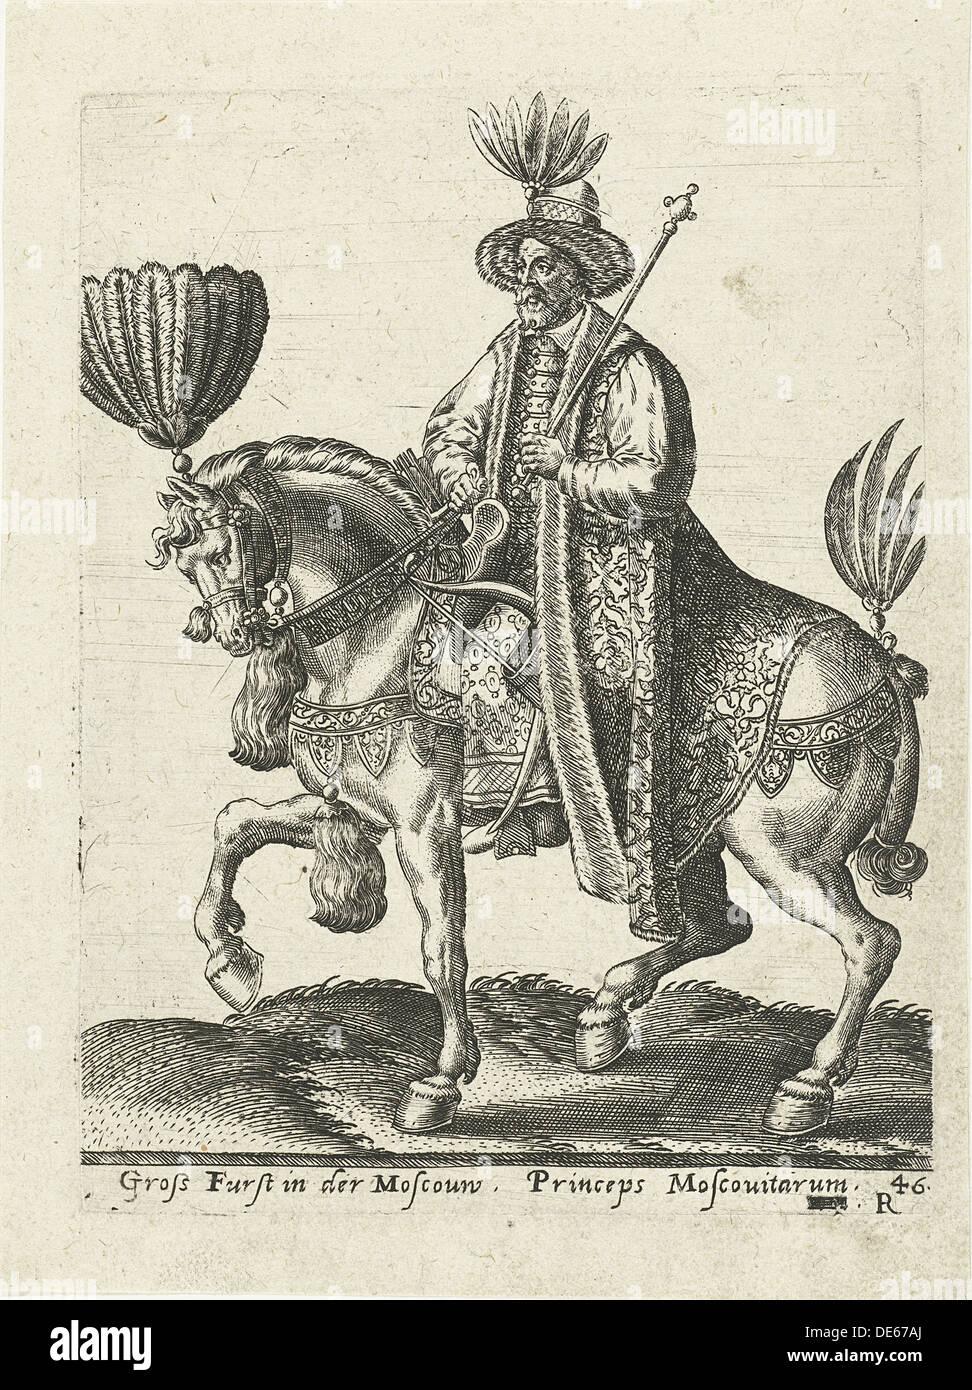 Grand Duke of Muscovy, 1577. Artist: Bruyn, Abraham de (1540-1587) - Stock Image